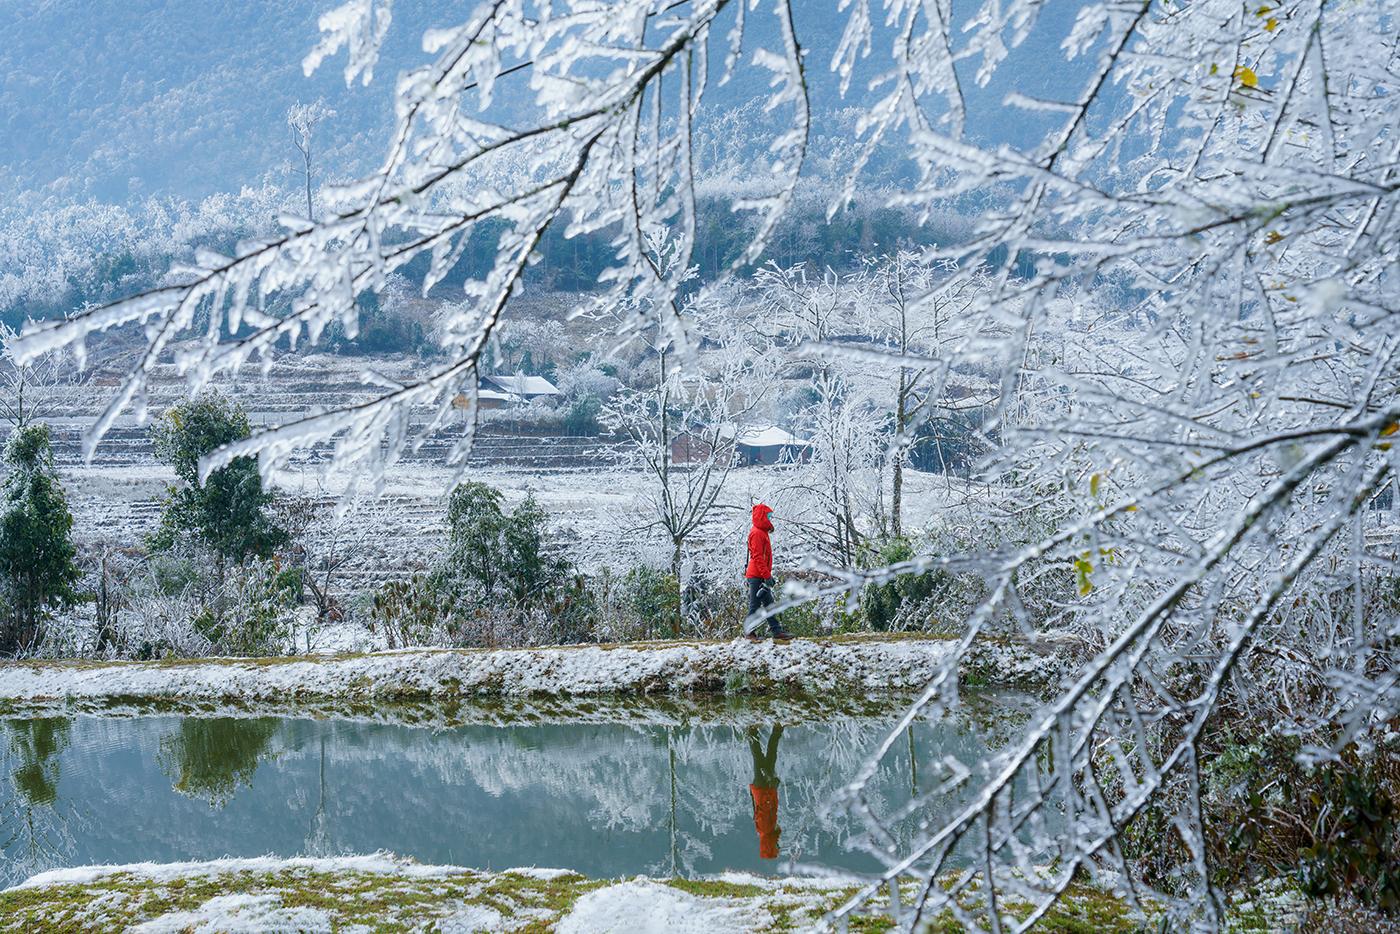 Northern Vietnam village ideal for snow hunters